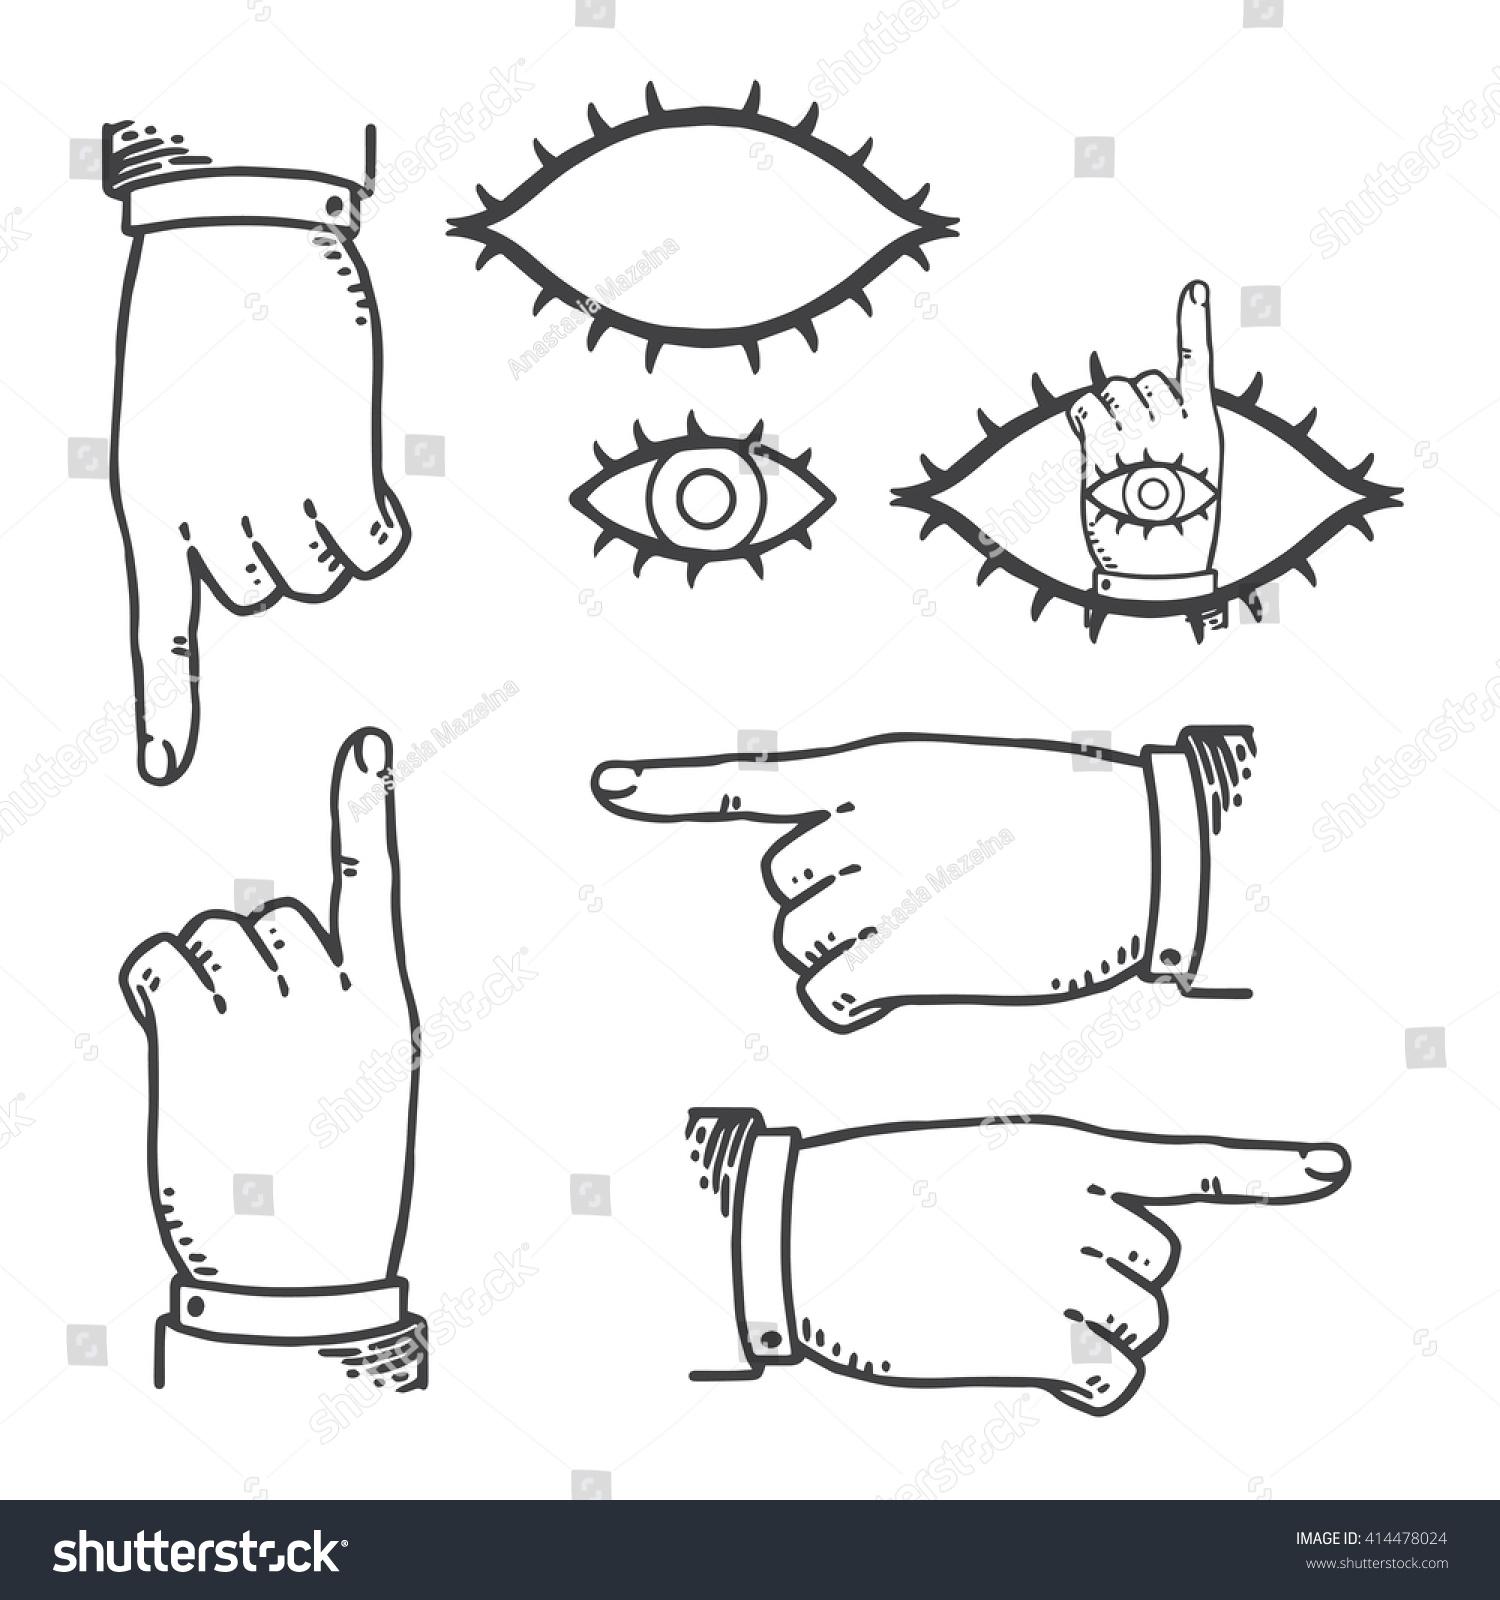 Set Vintage Hands Pointing Finger Retro Stock Vector 414478024